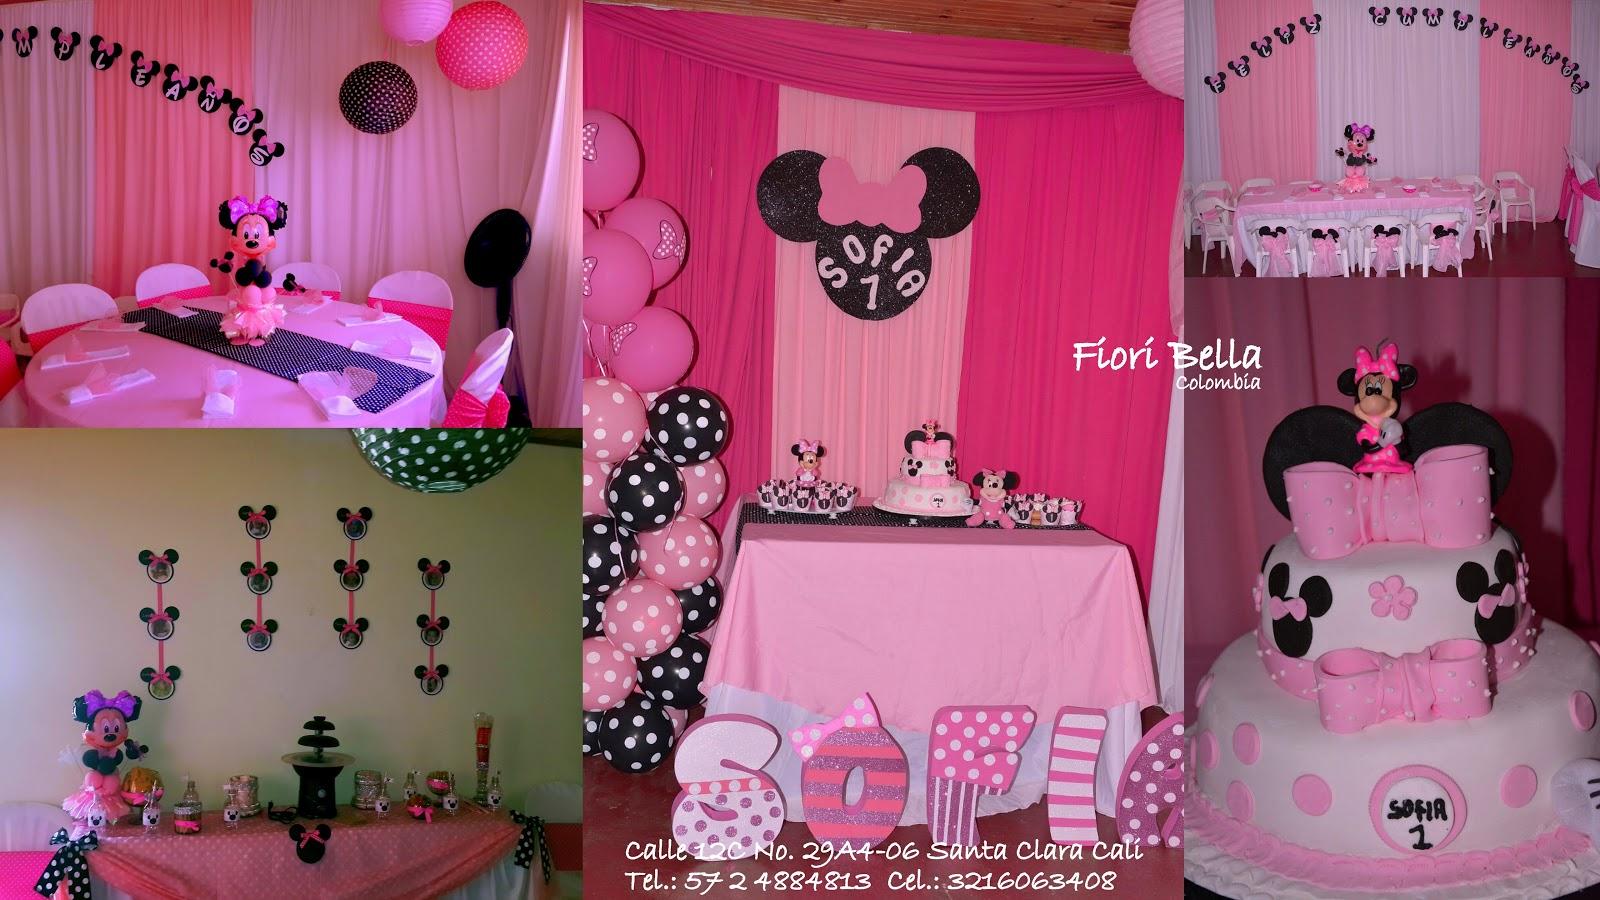 Fiesta Infantil Nina Tematica Minie Mouse Fiori Bella Colombia